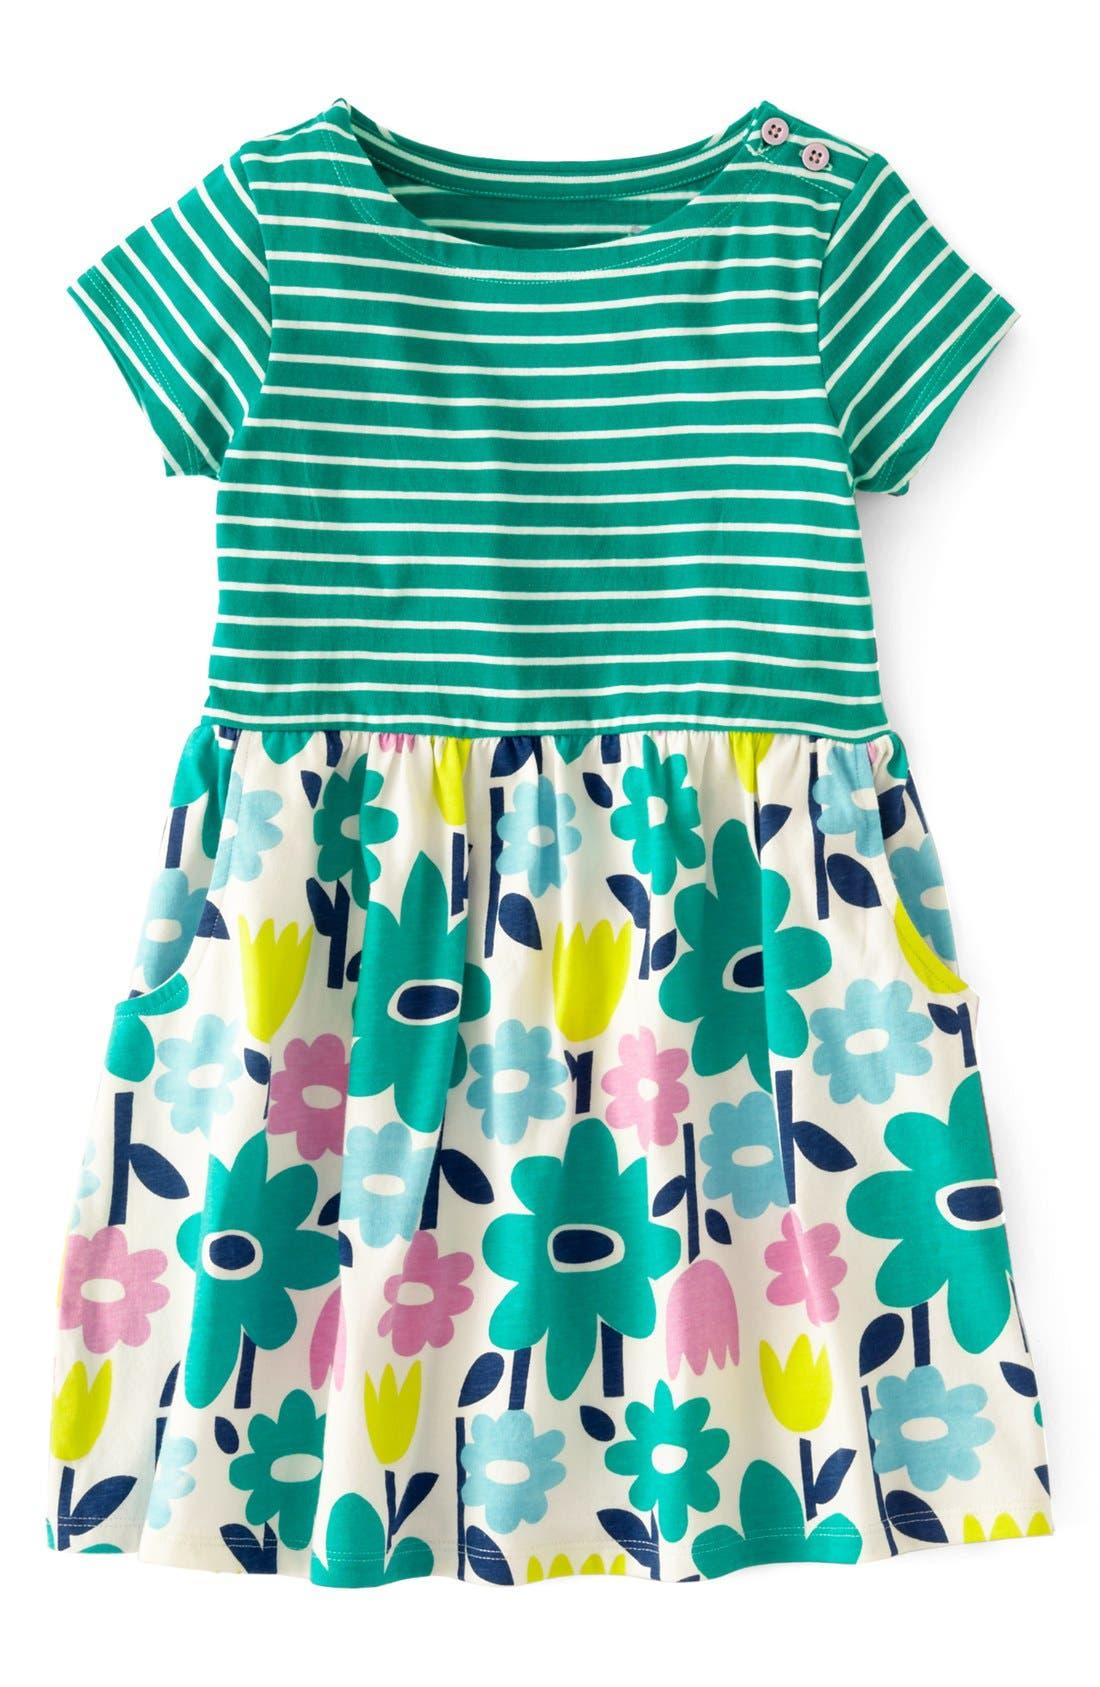 MINI BODEN, 'Hotchpotch' Jersey Dress, Main thumbnail 1, color, 304